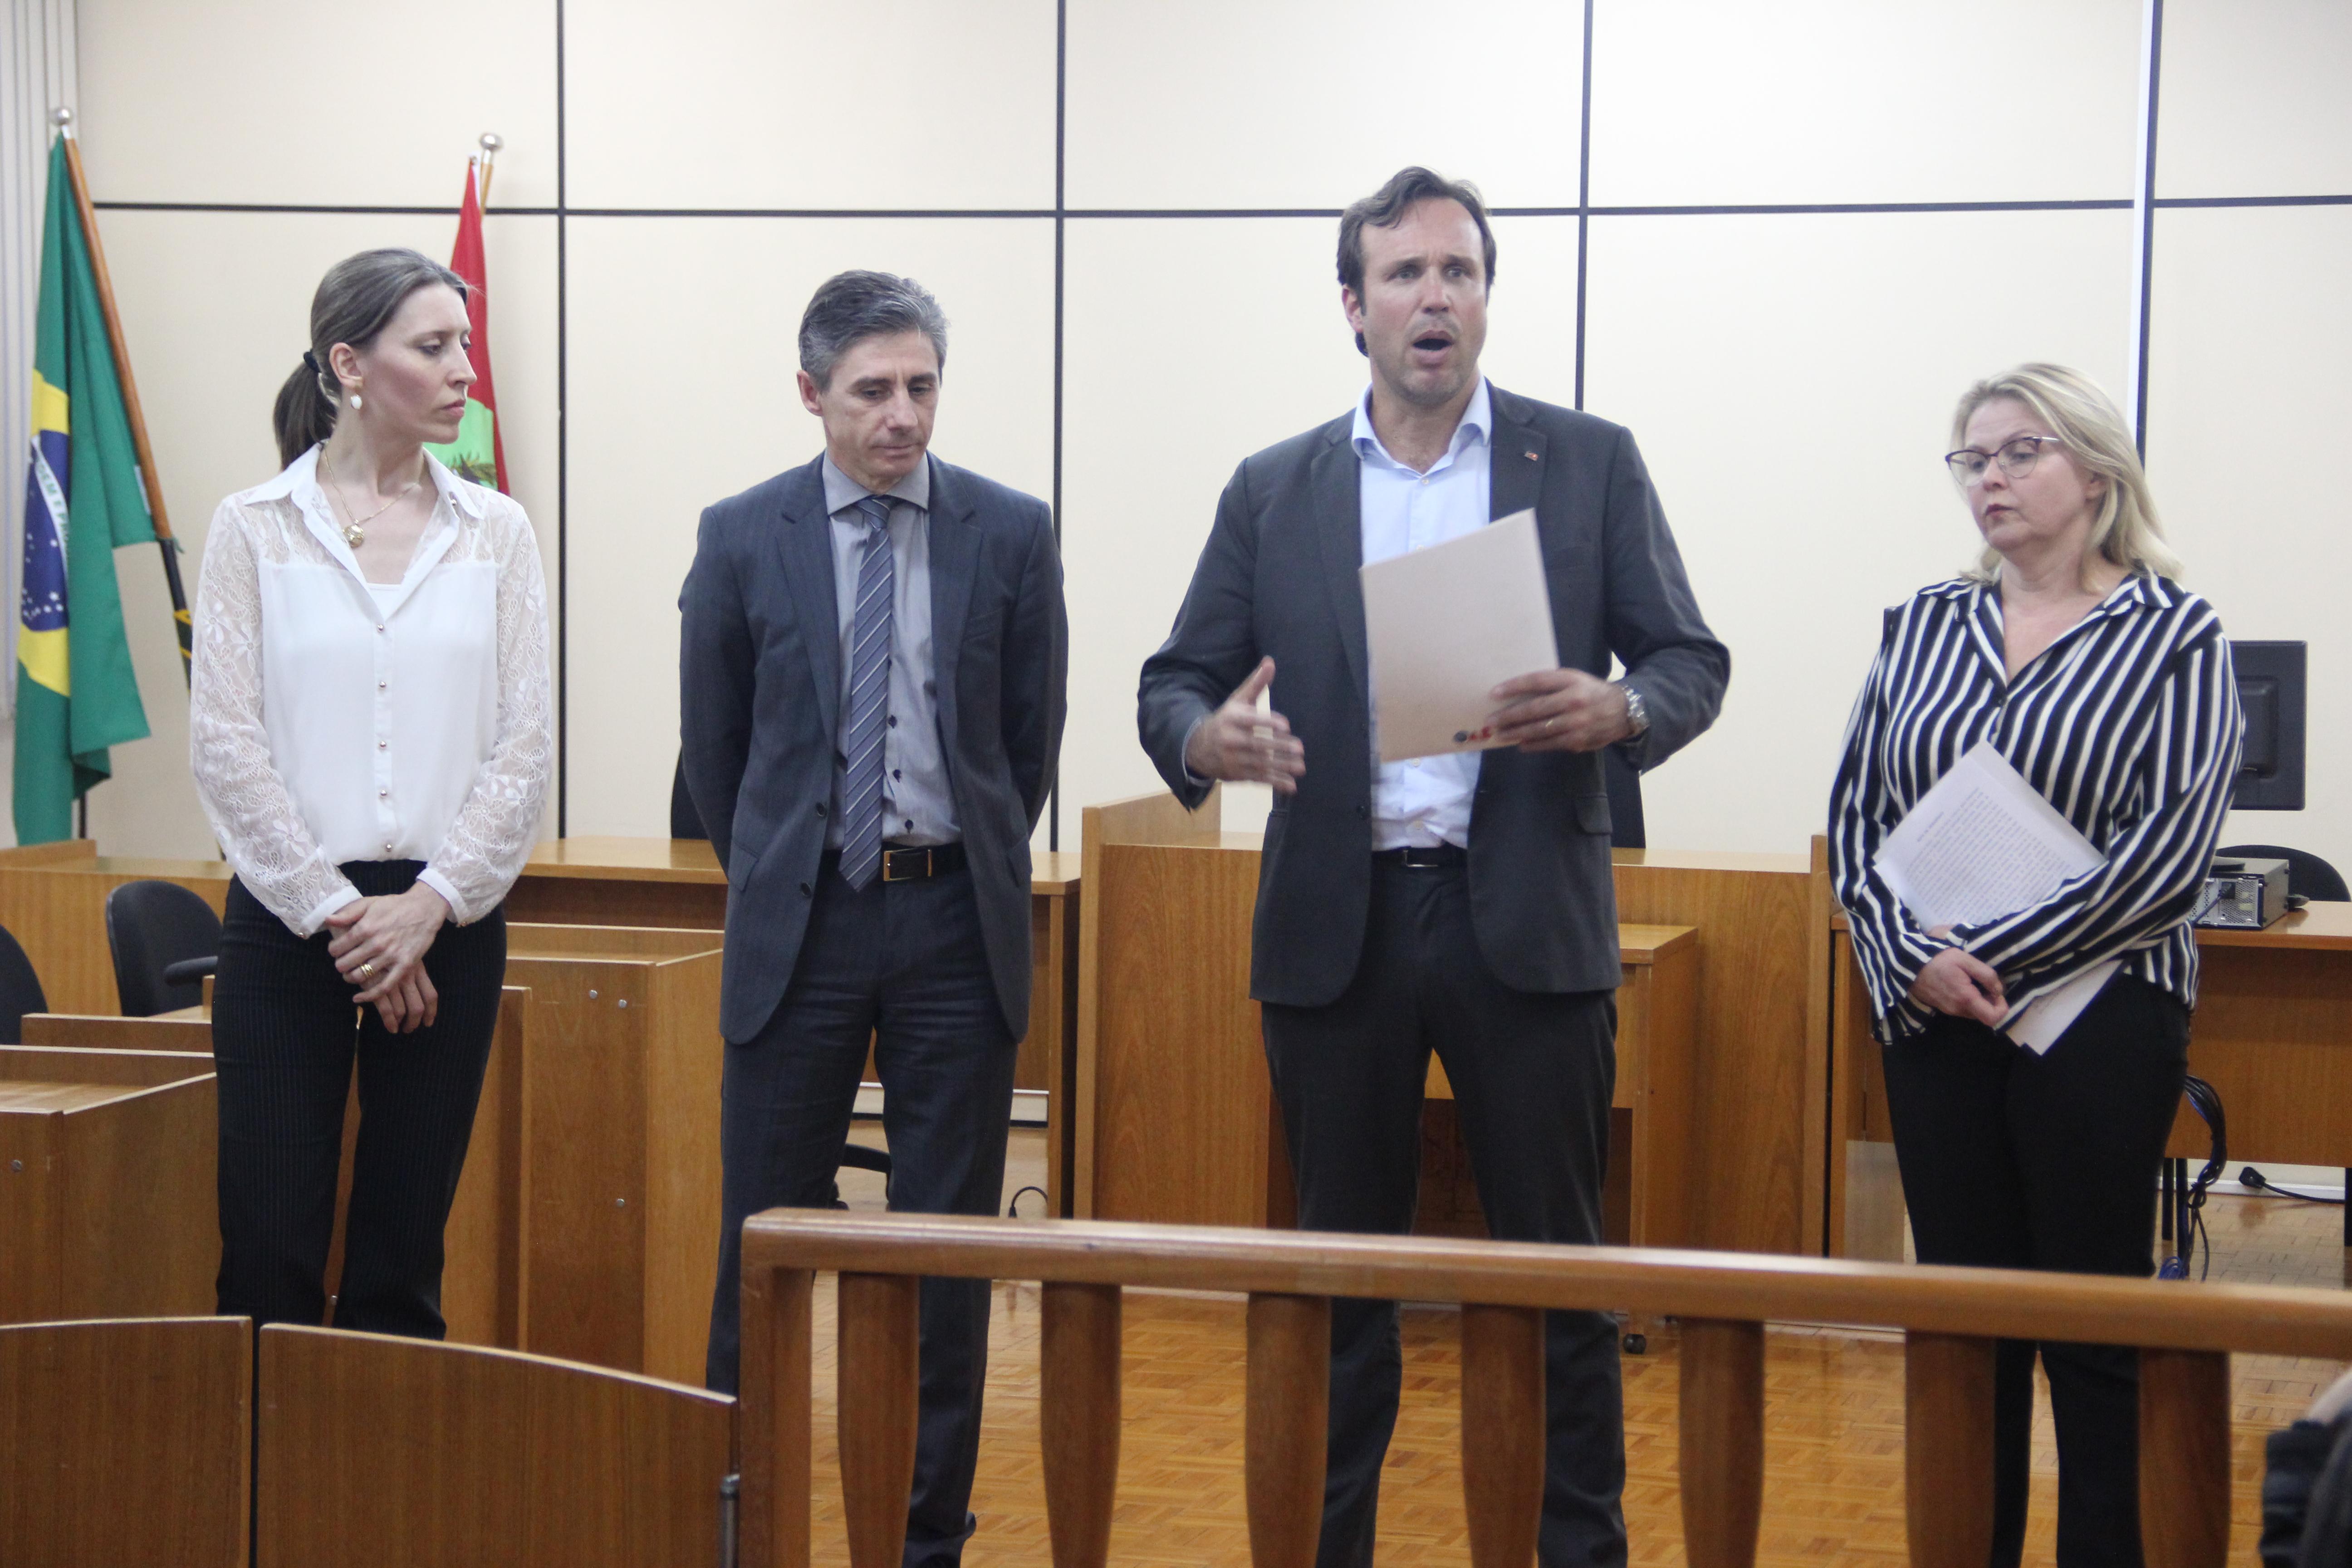 OAB realiza Desagravo Público sobre o que considera desrespeito de promotor contra advogado